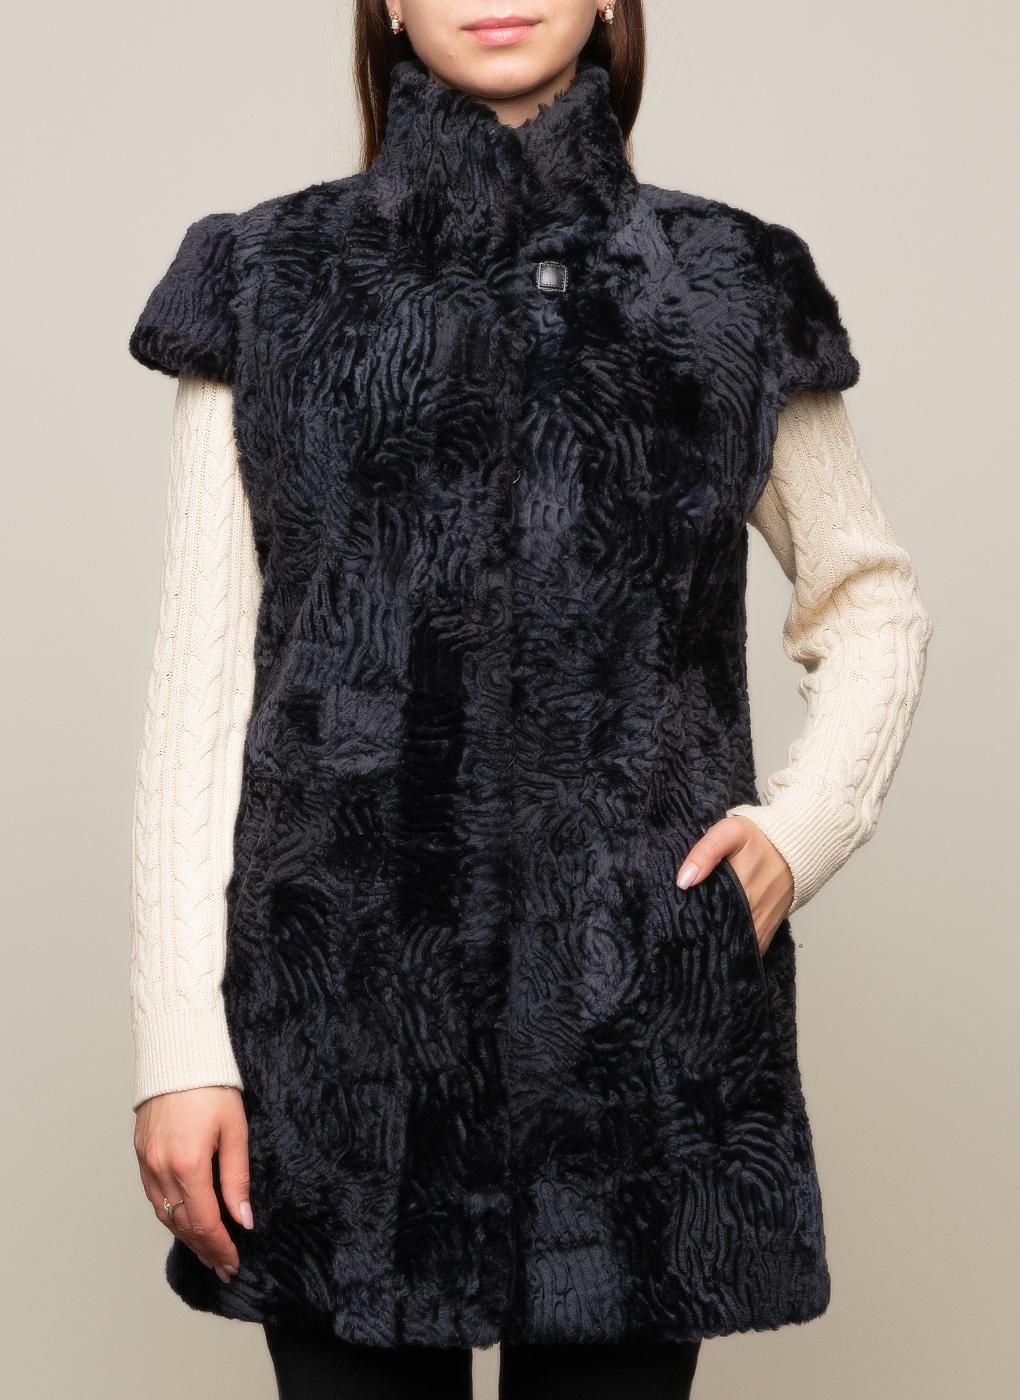 Жилет из овчины 01, Anna Romanova furs